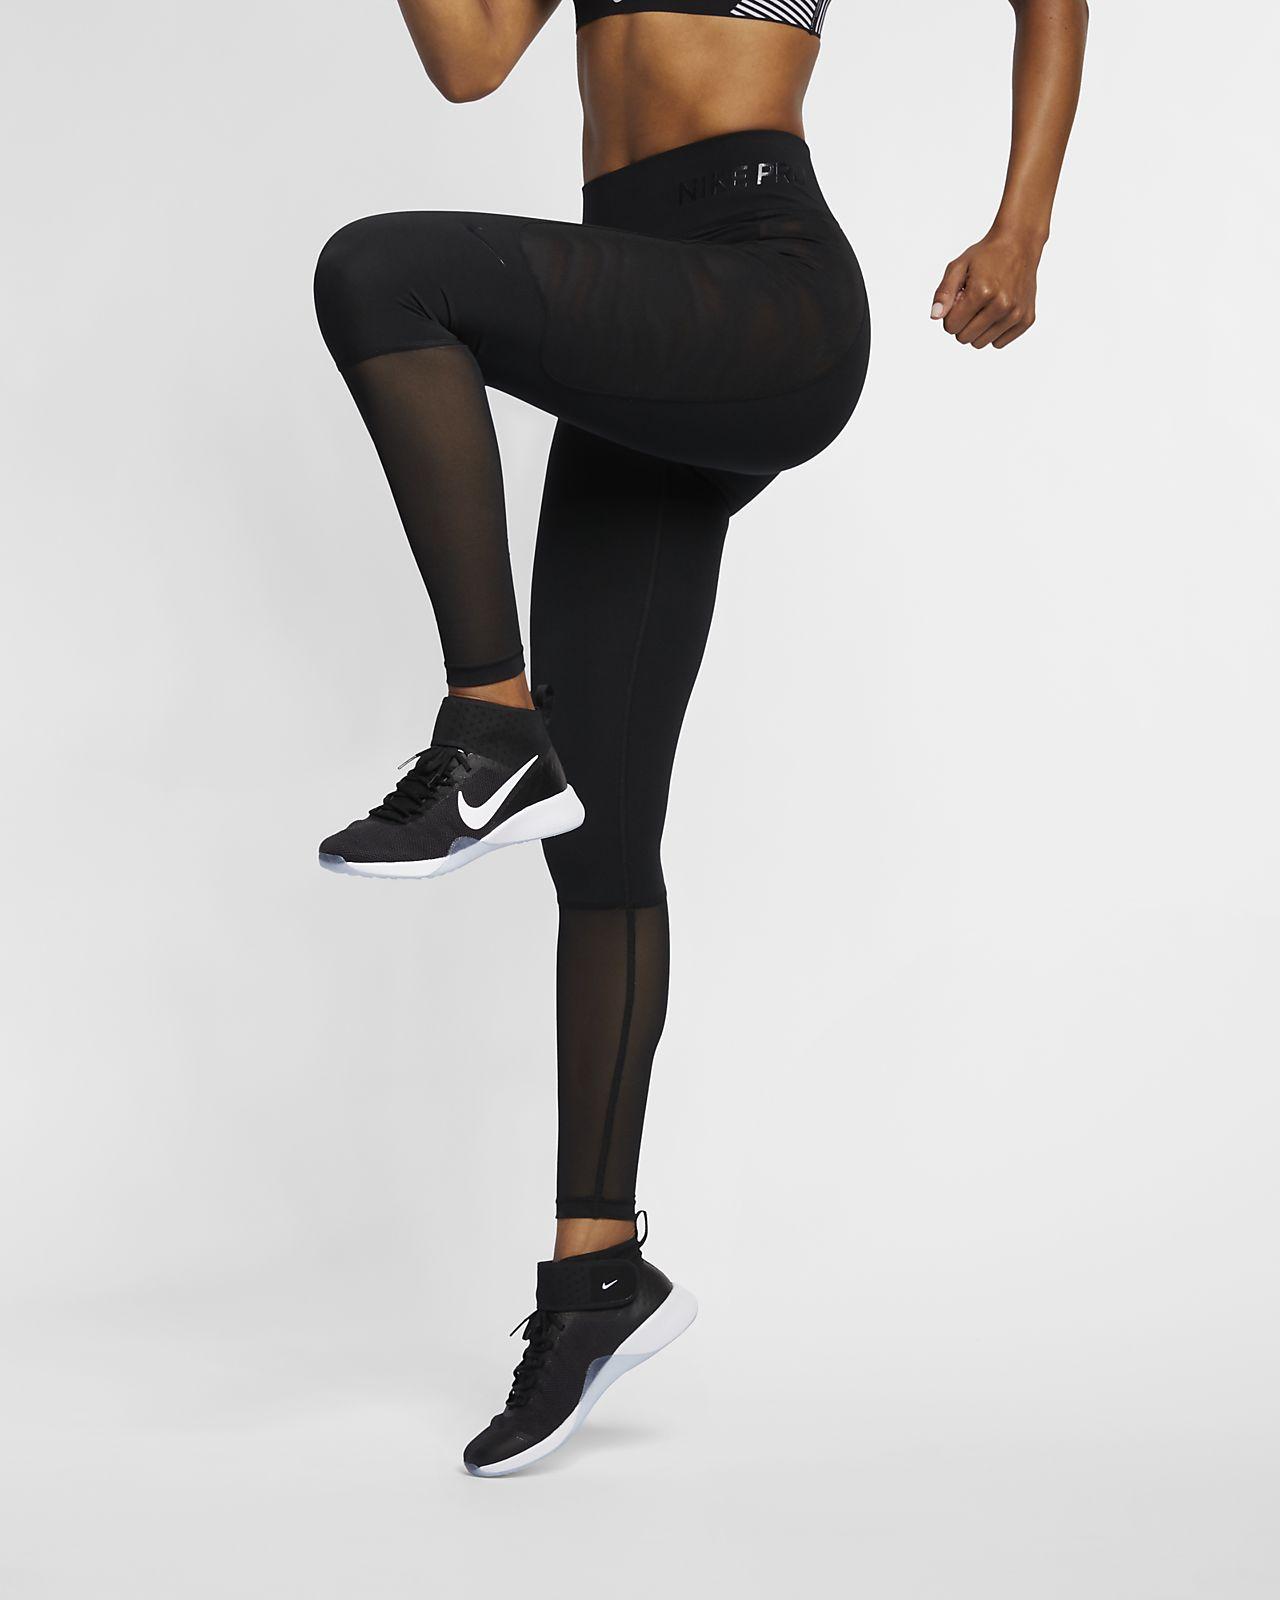 Legginsy damskie Nike Pro HyperCool